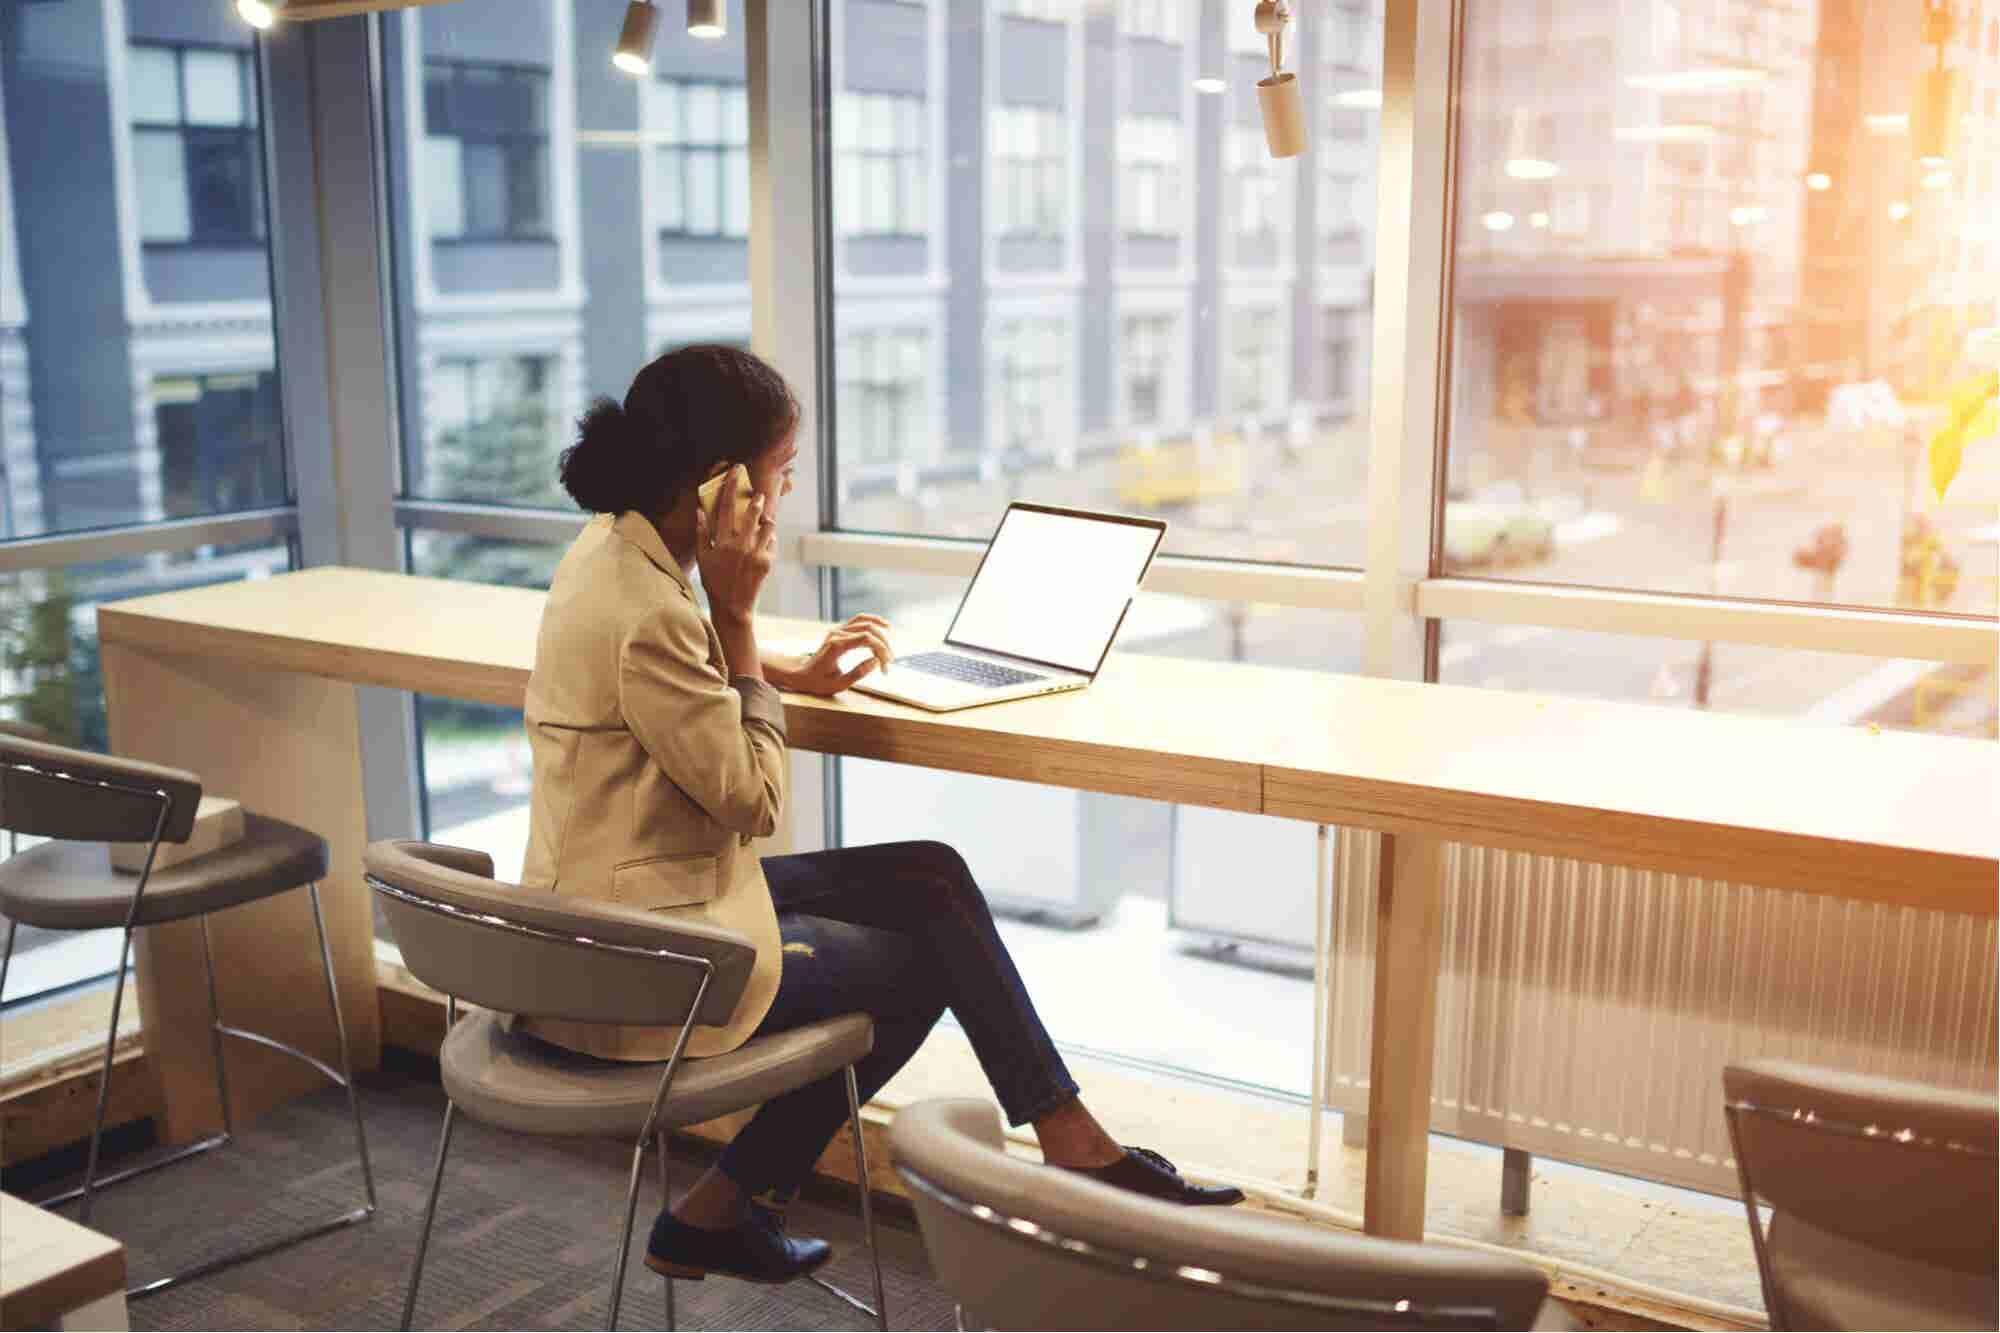 UAE Startup The Ambassador Set To Score The Best Corporate Deals For Entrepreneurs